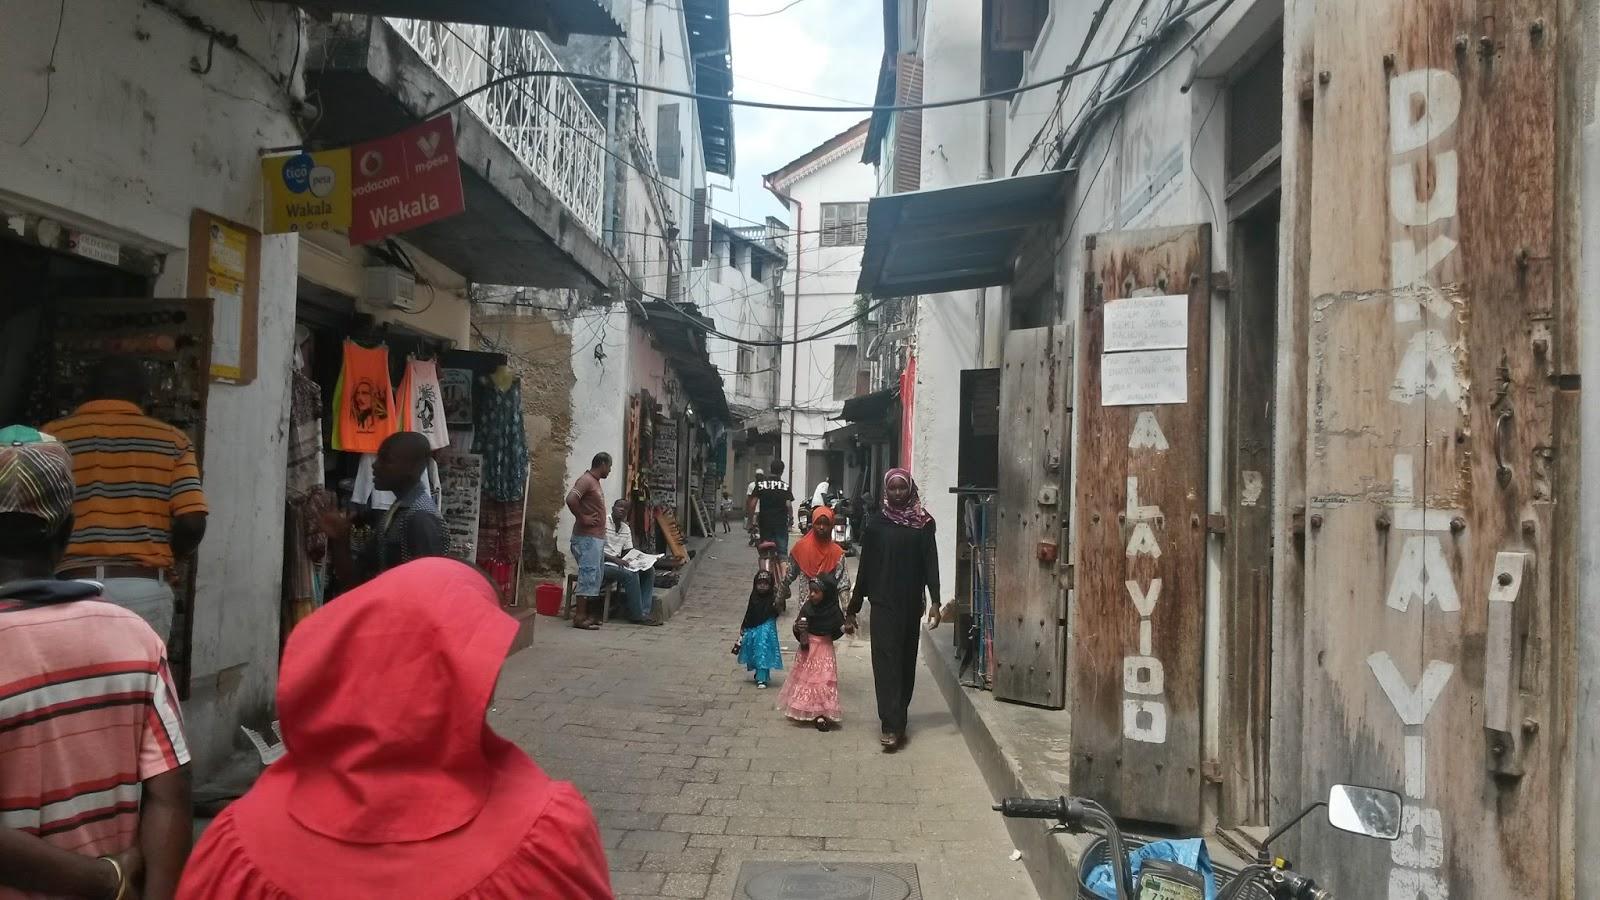 zanzibar stone town afrika streets